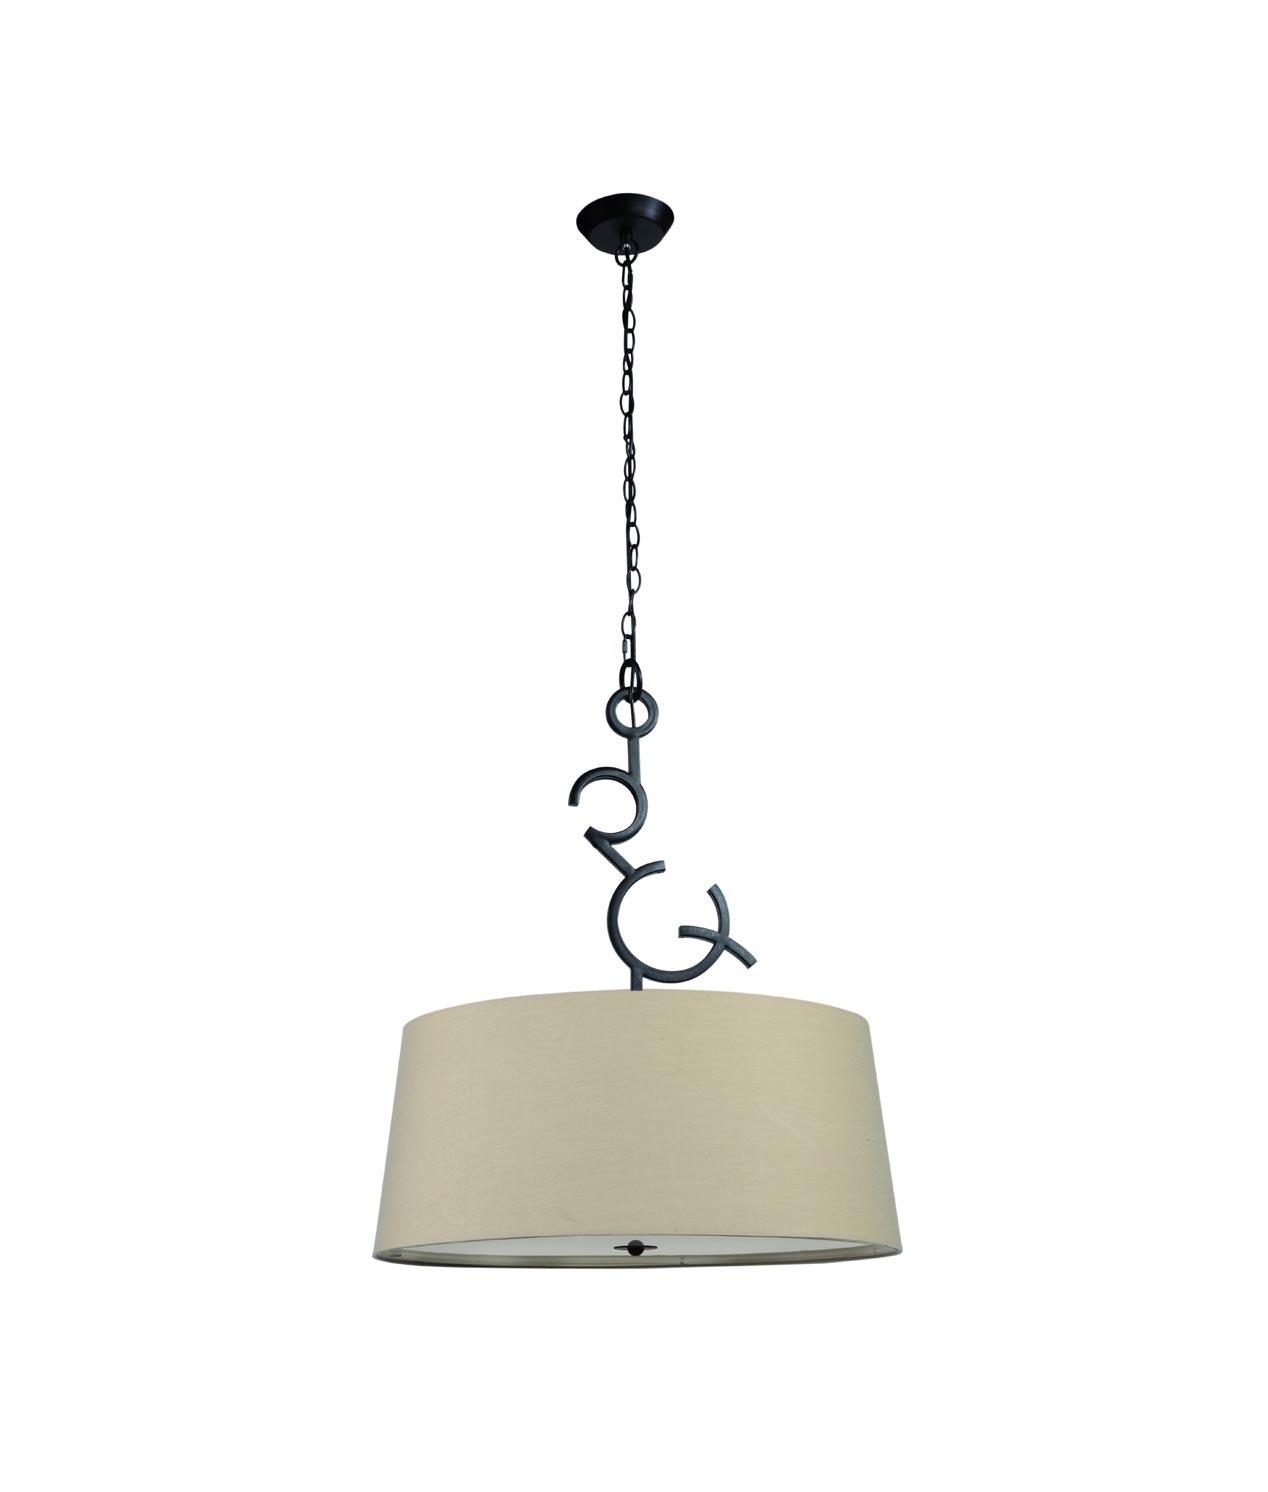 Lámpara colgante ARGI 3 luces